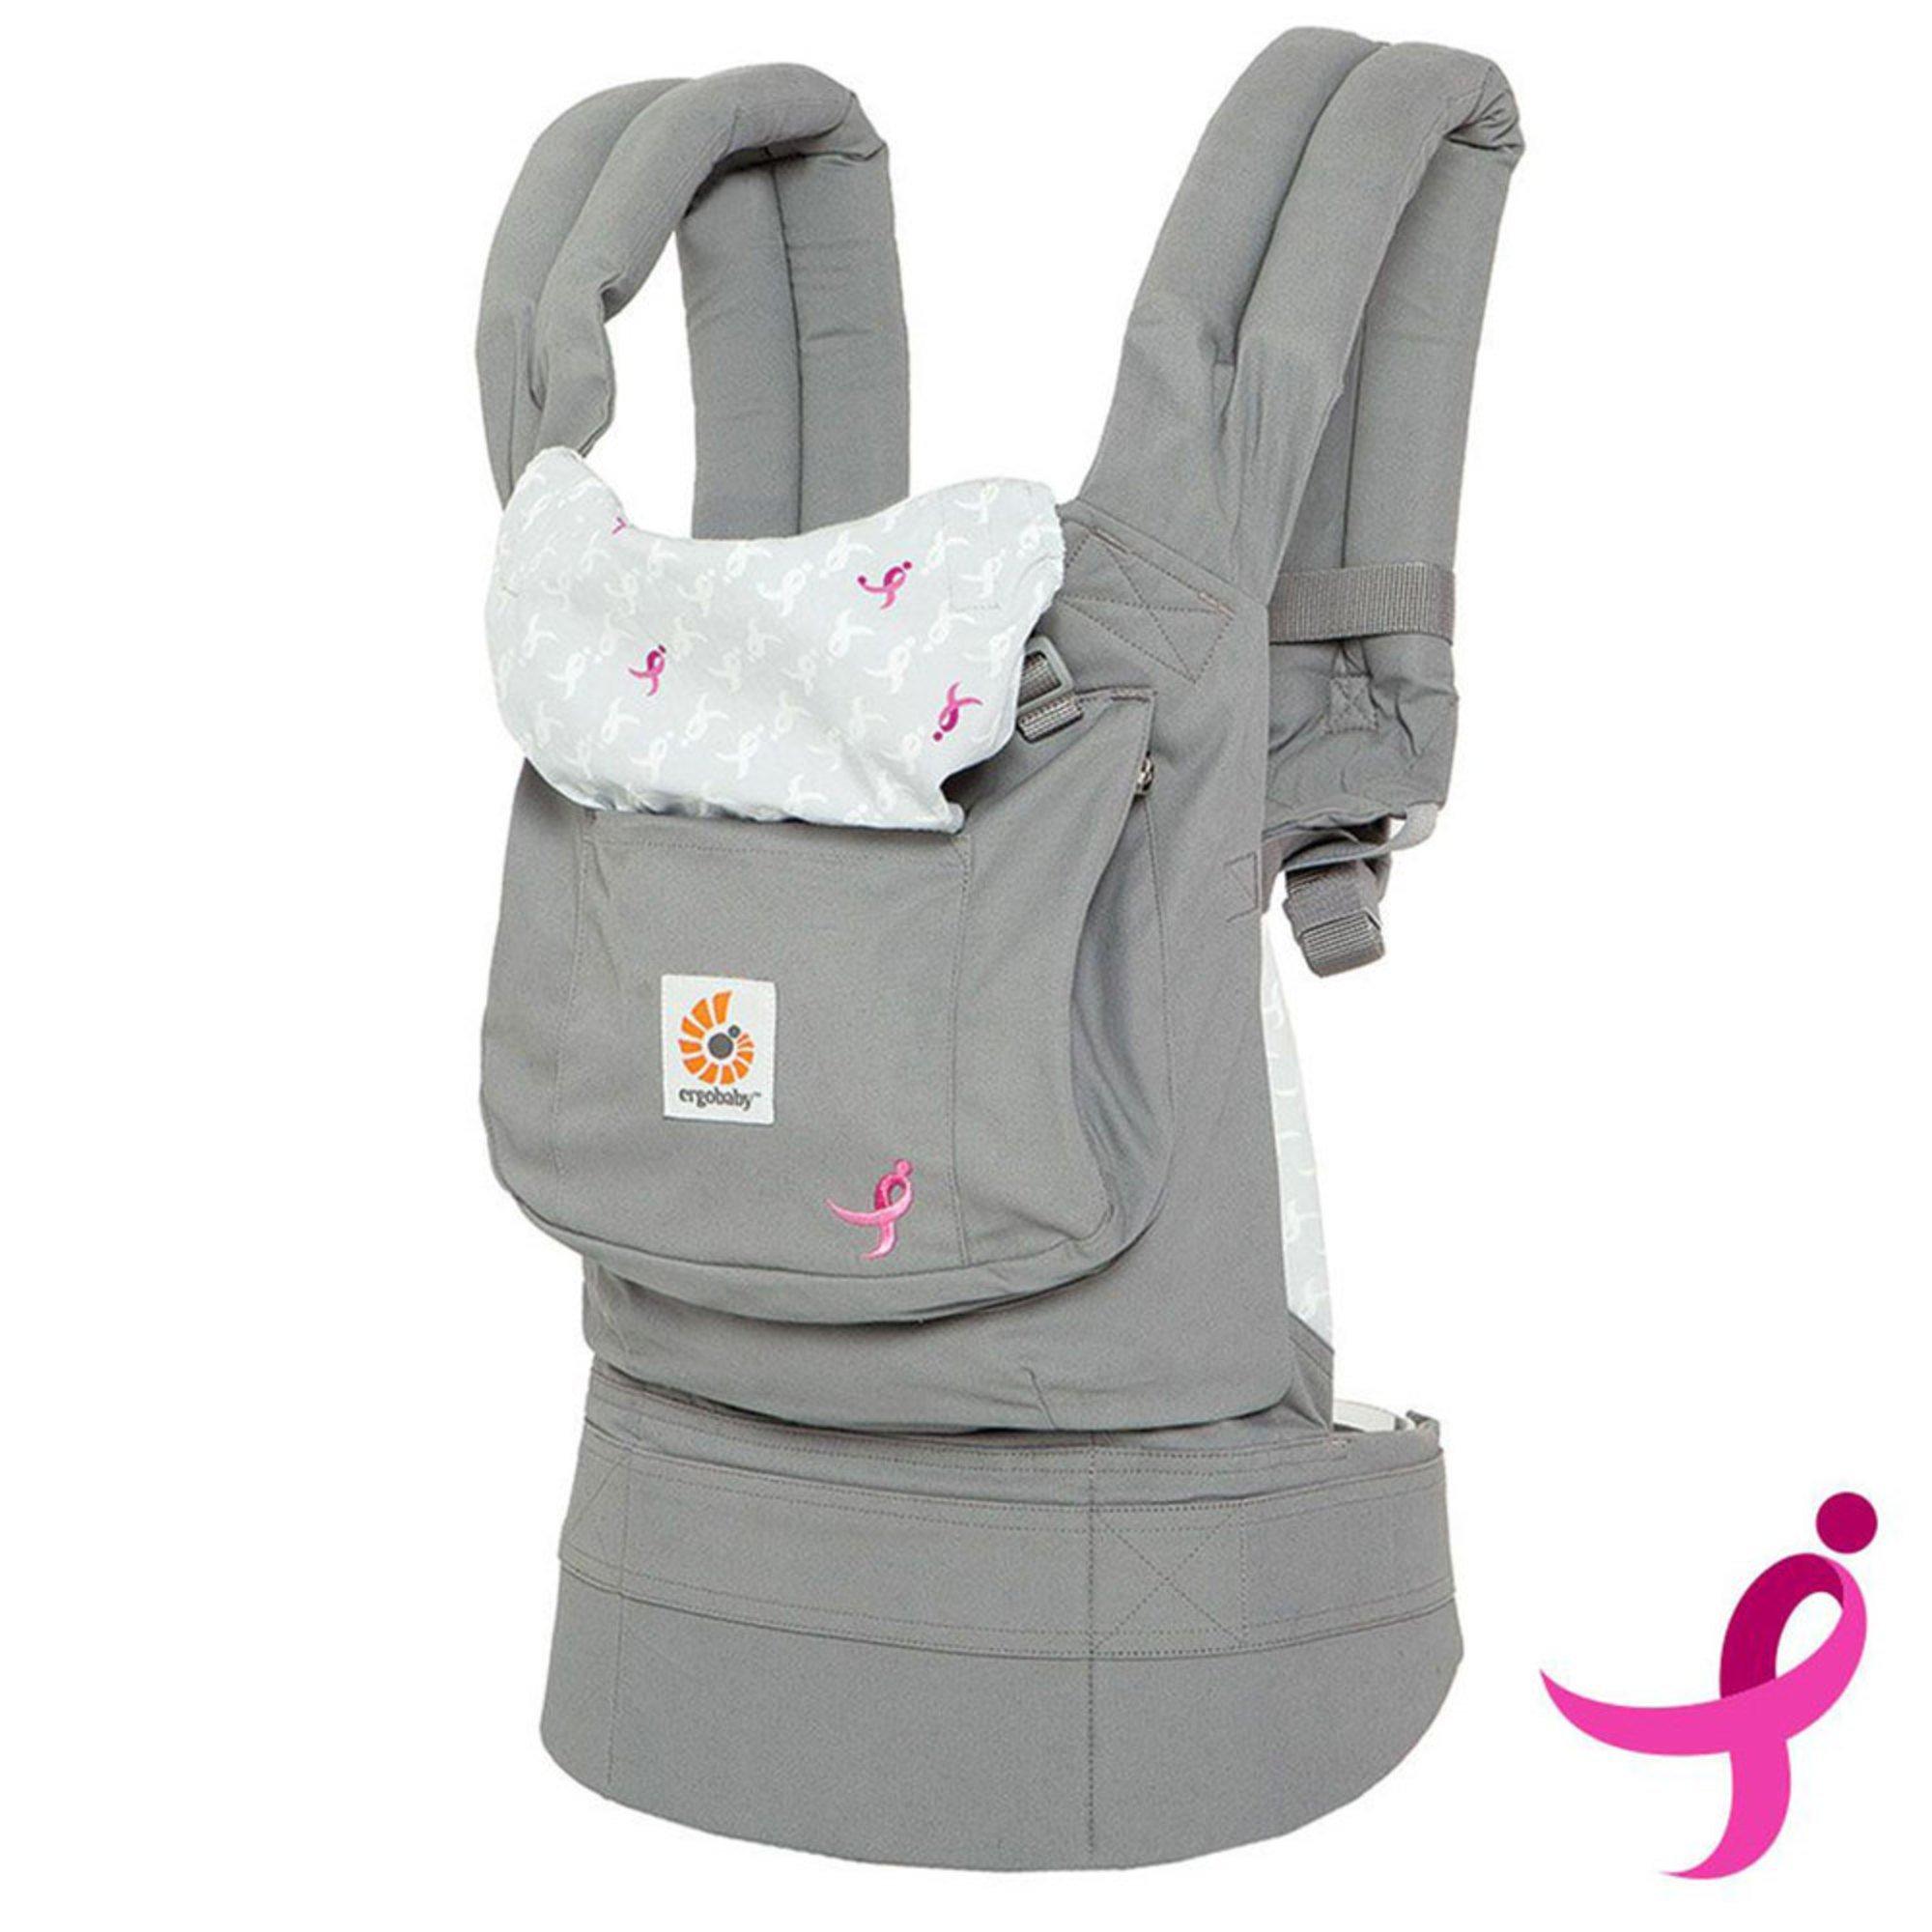 15d46524b8d Ergobaby. Ergobaby Original 3-Position Baby Carrier ...